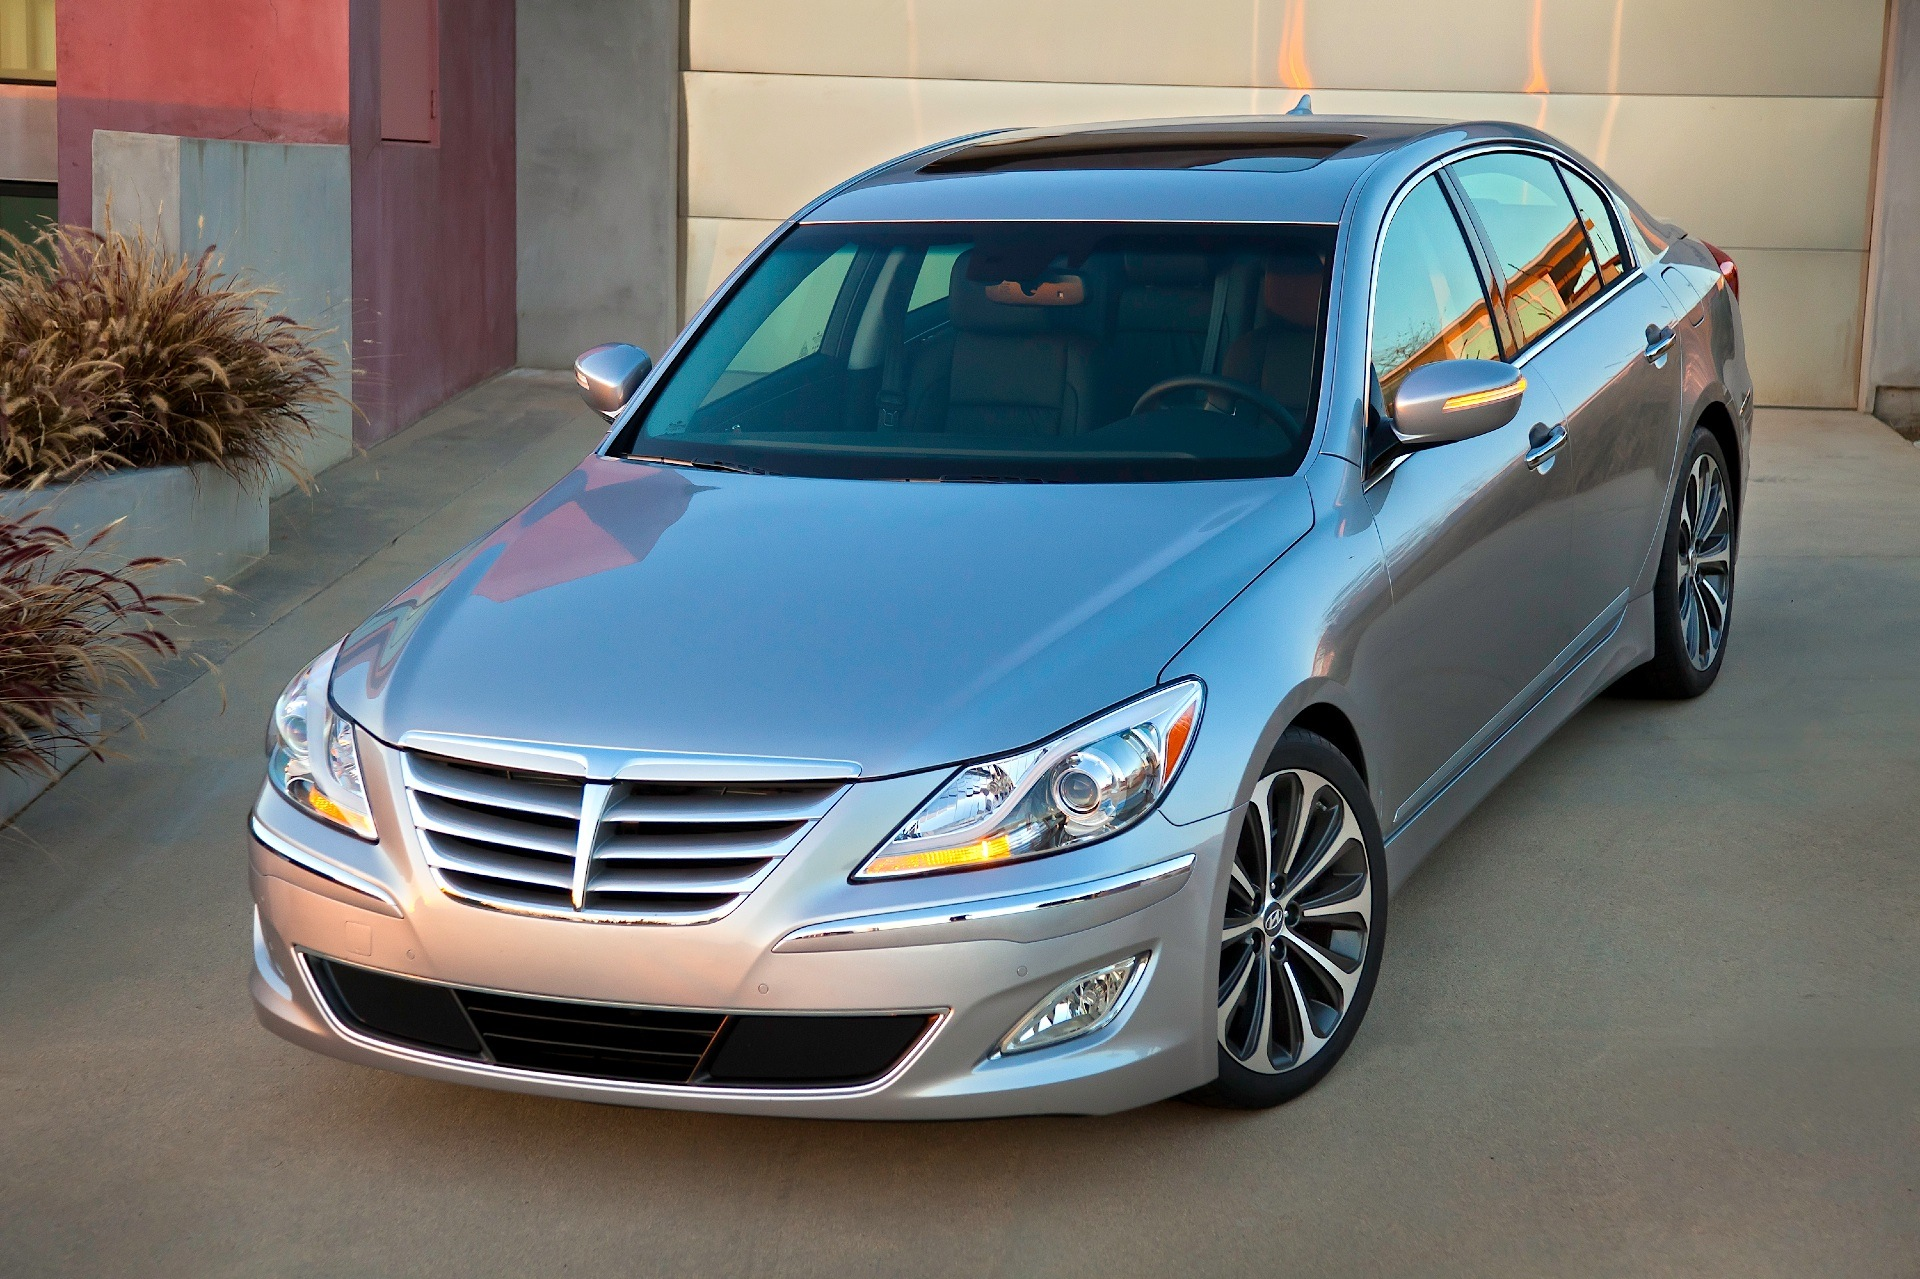 Hyundai Genesis Specs 2008 2009 2010 2011 2012 2013